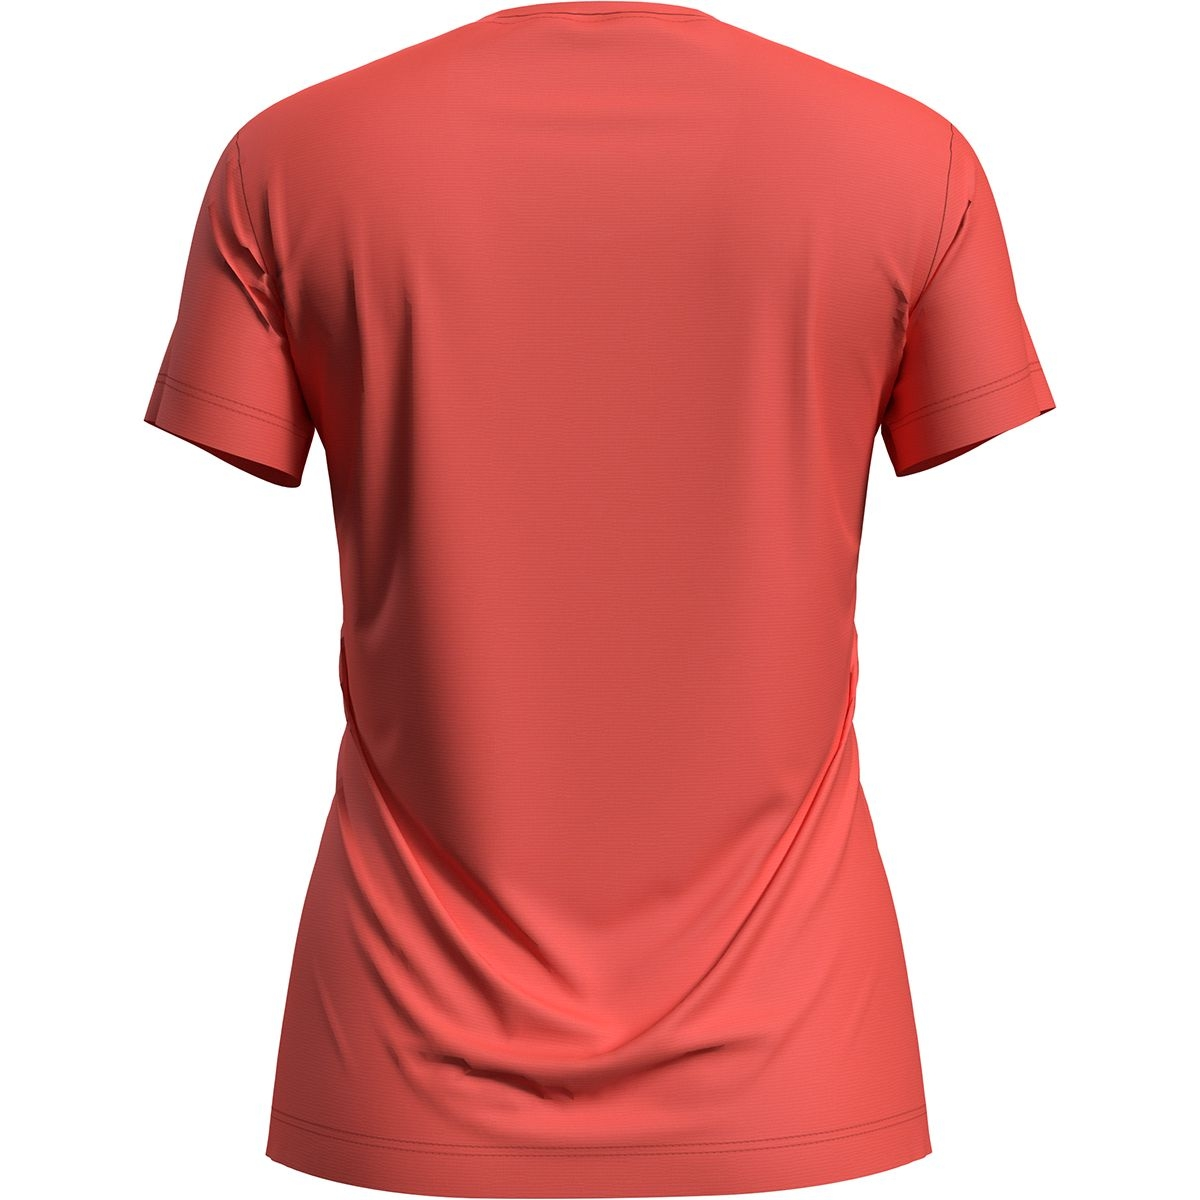 Odlo Damen ELEMENT T-Shirt 313141 hot coral